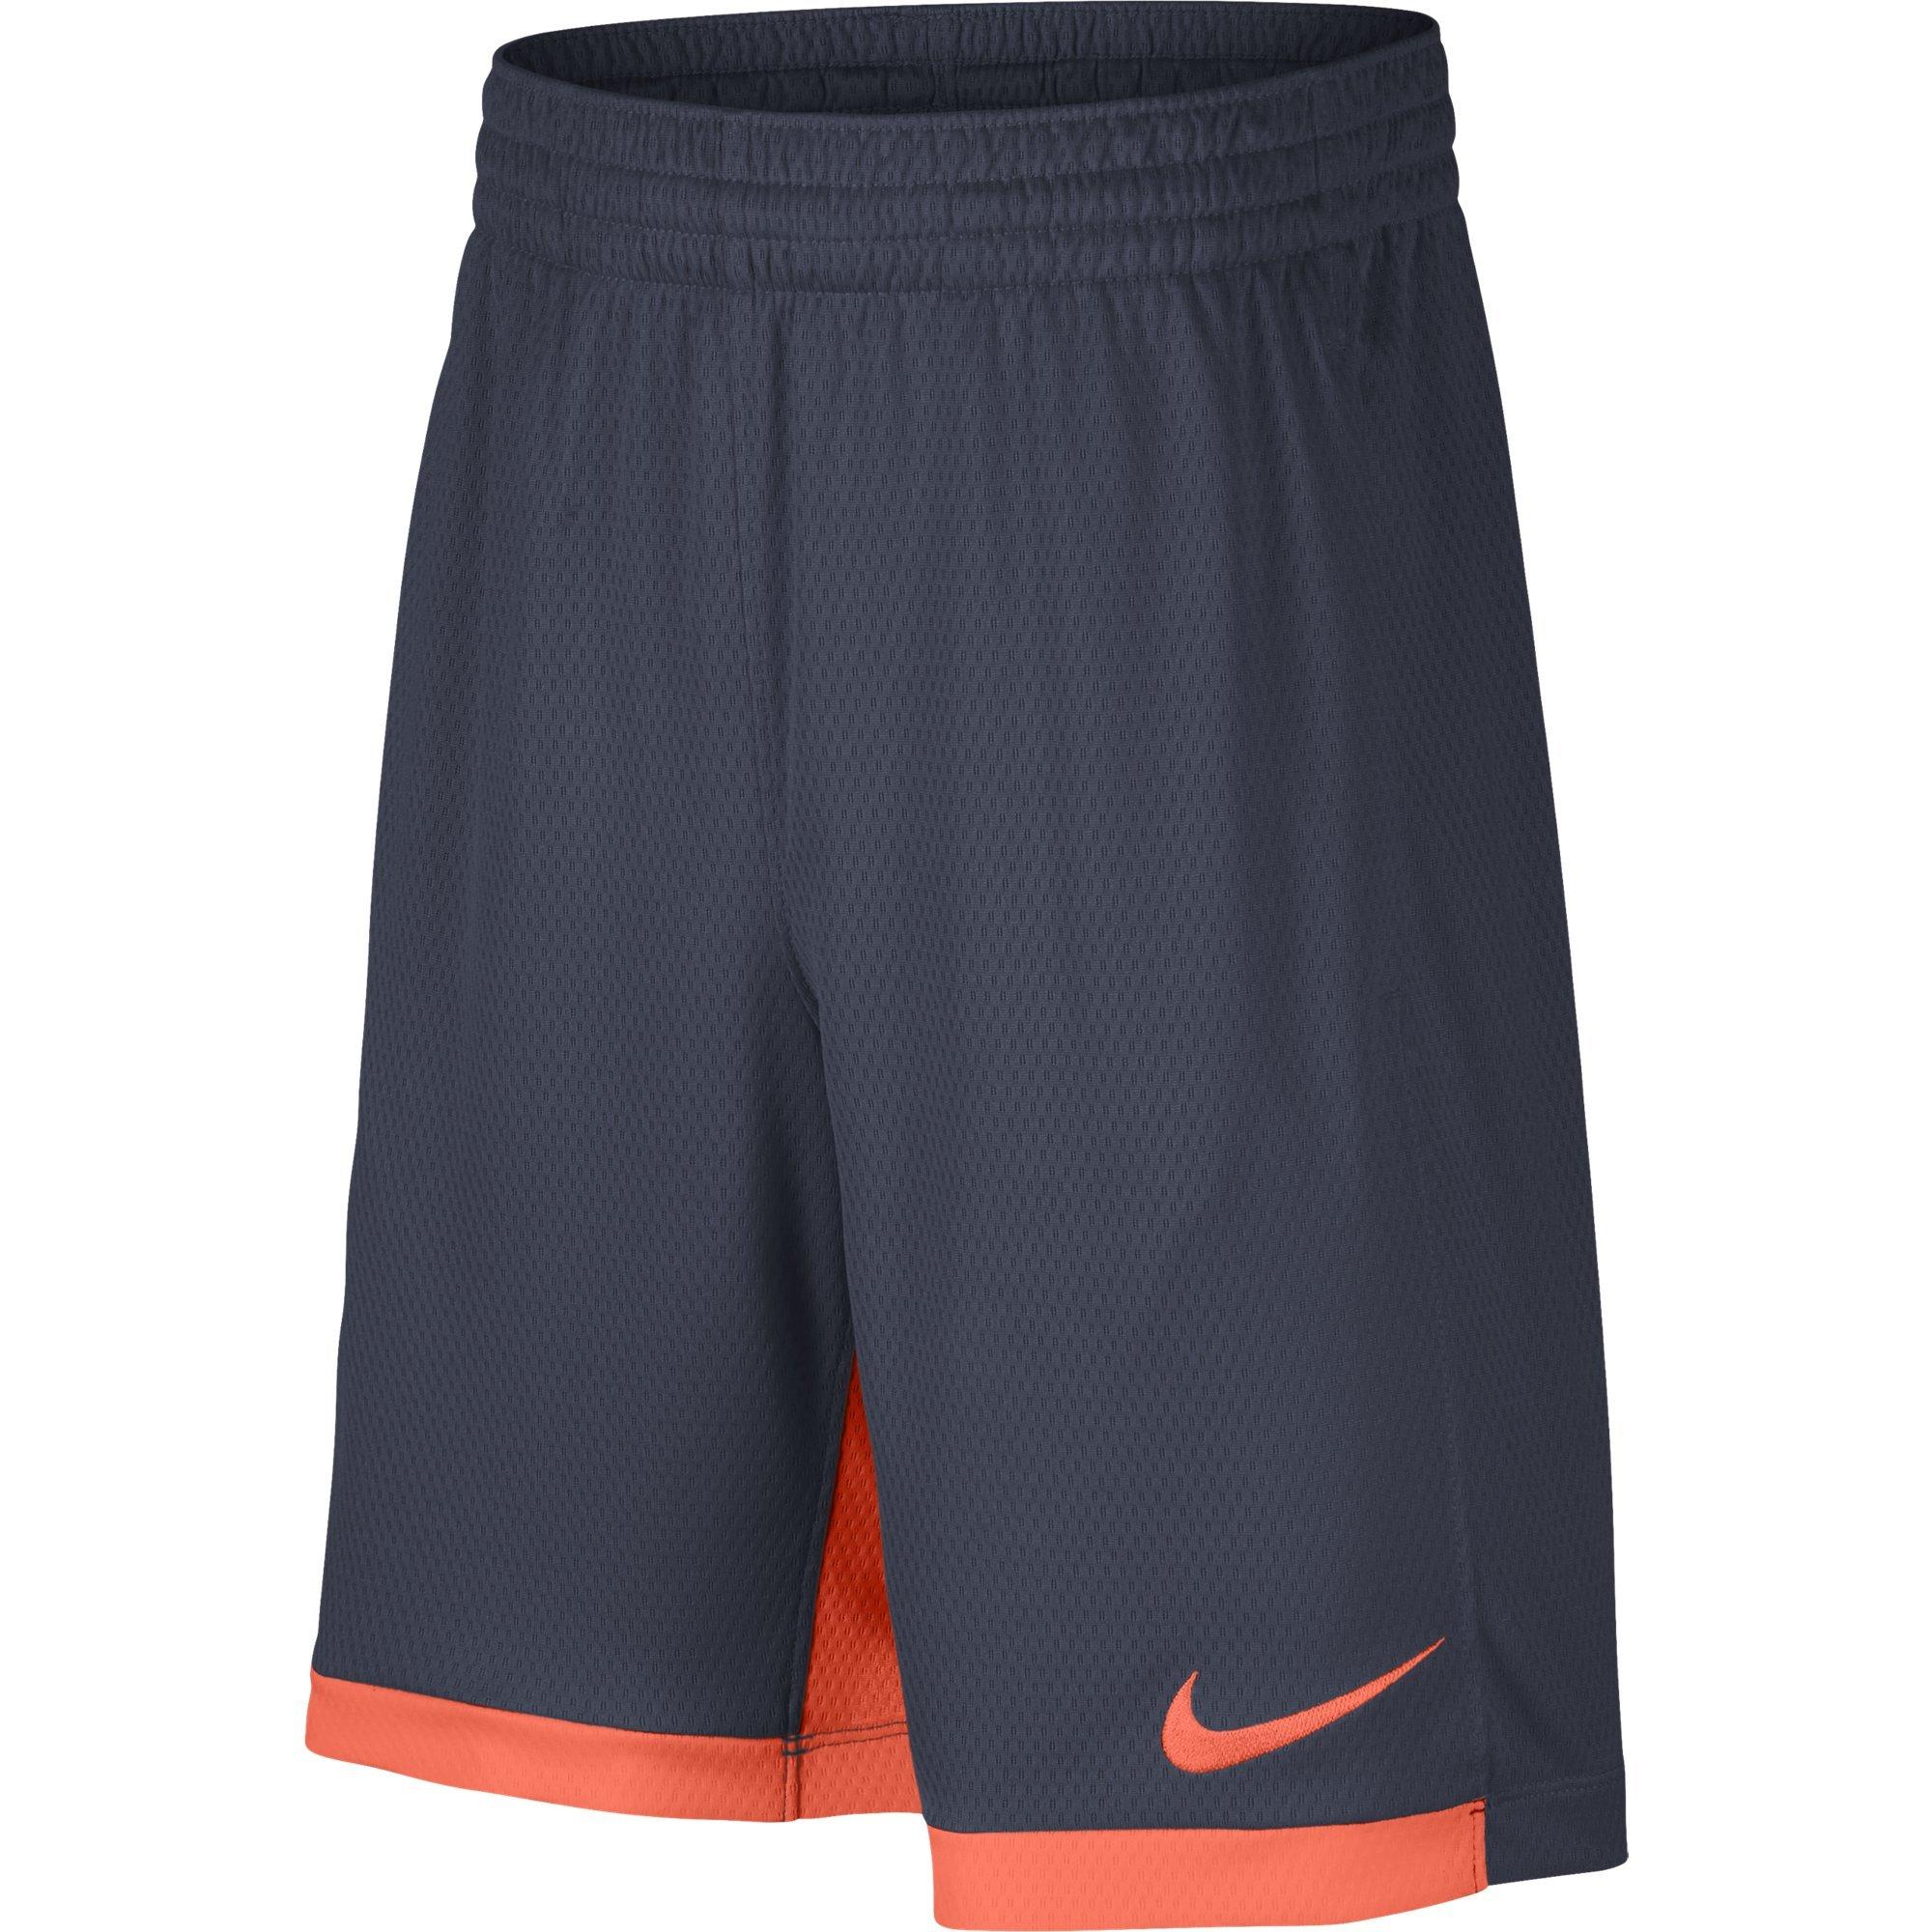 NIKE Boys' Dry Trophy Athletic Shorts, Thunder Blue/Hyper Crimson/Hyper Crimson, Medium